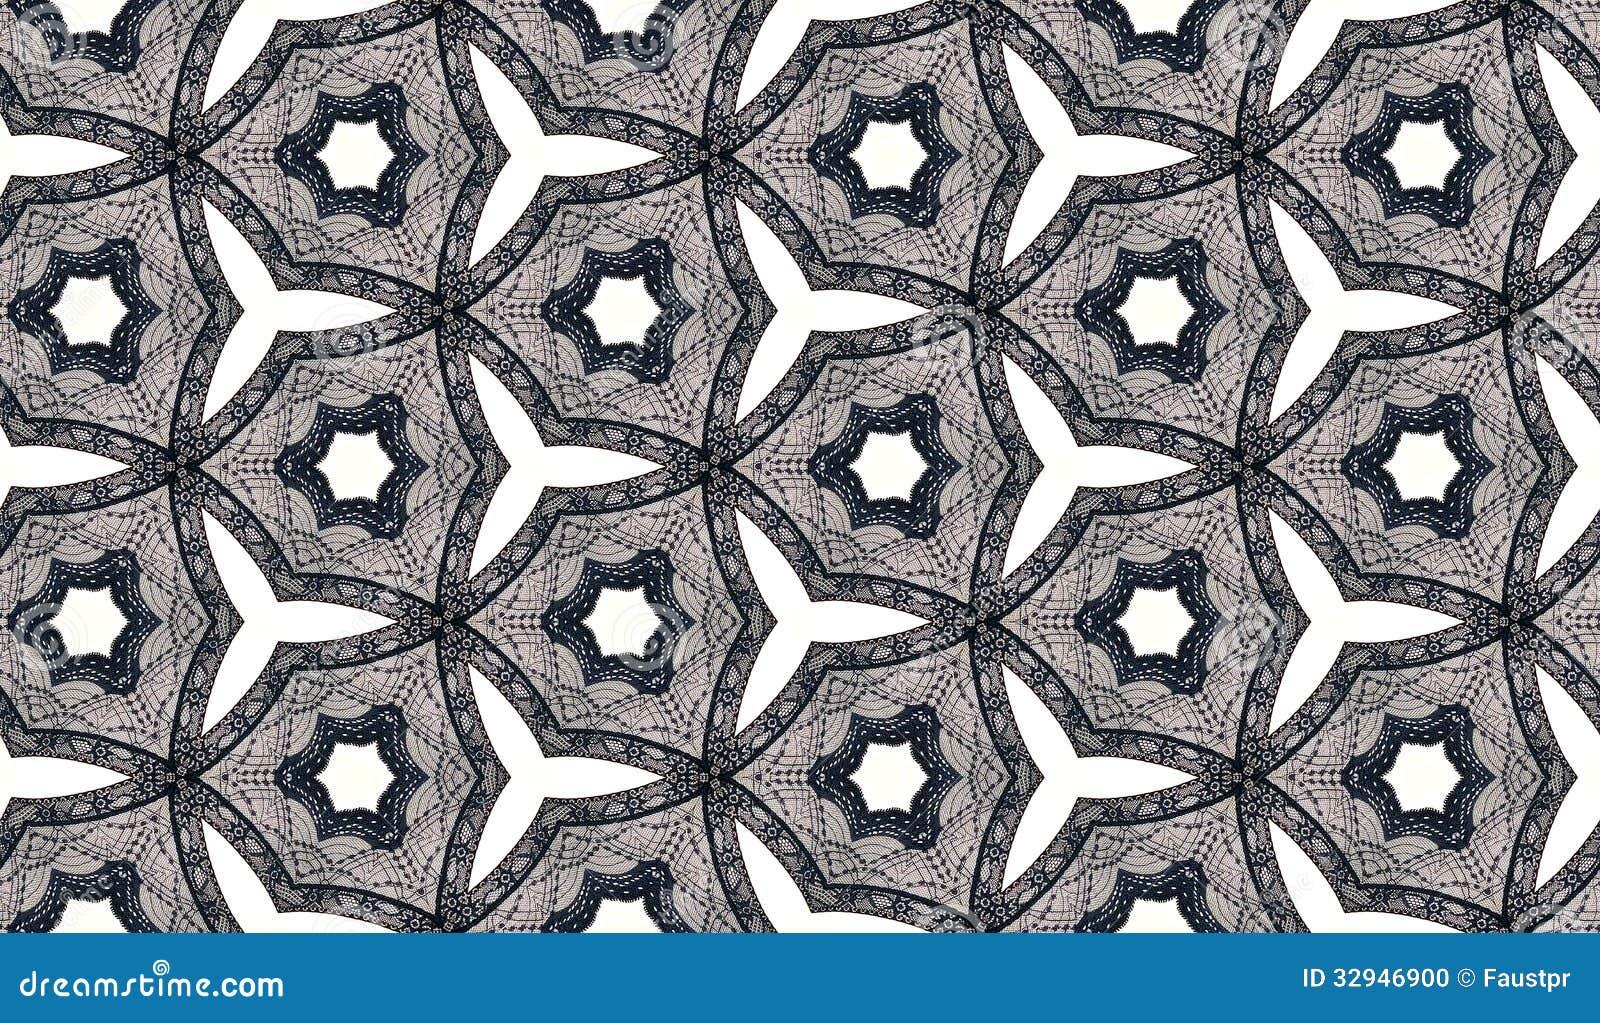 lace background tile - photo #4